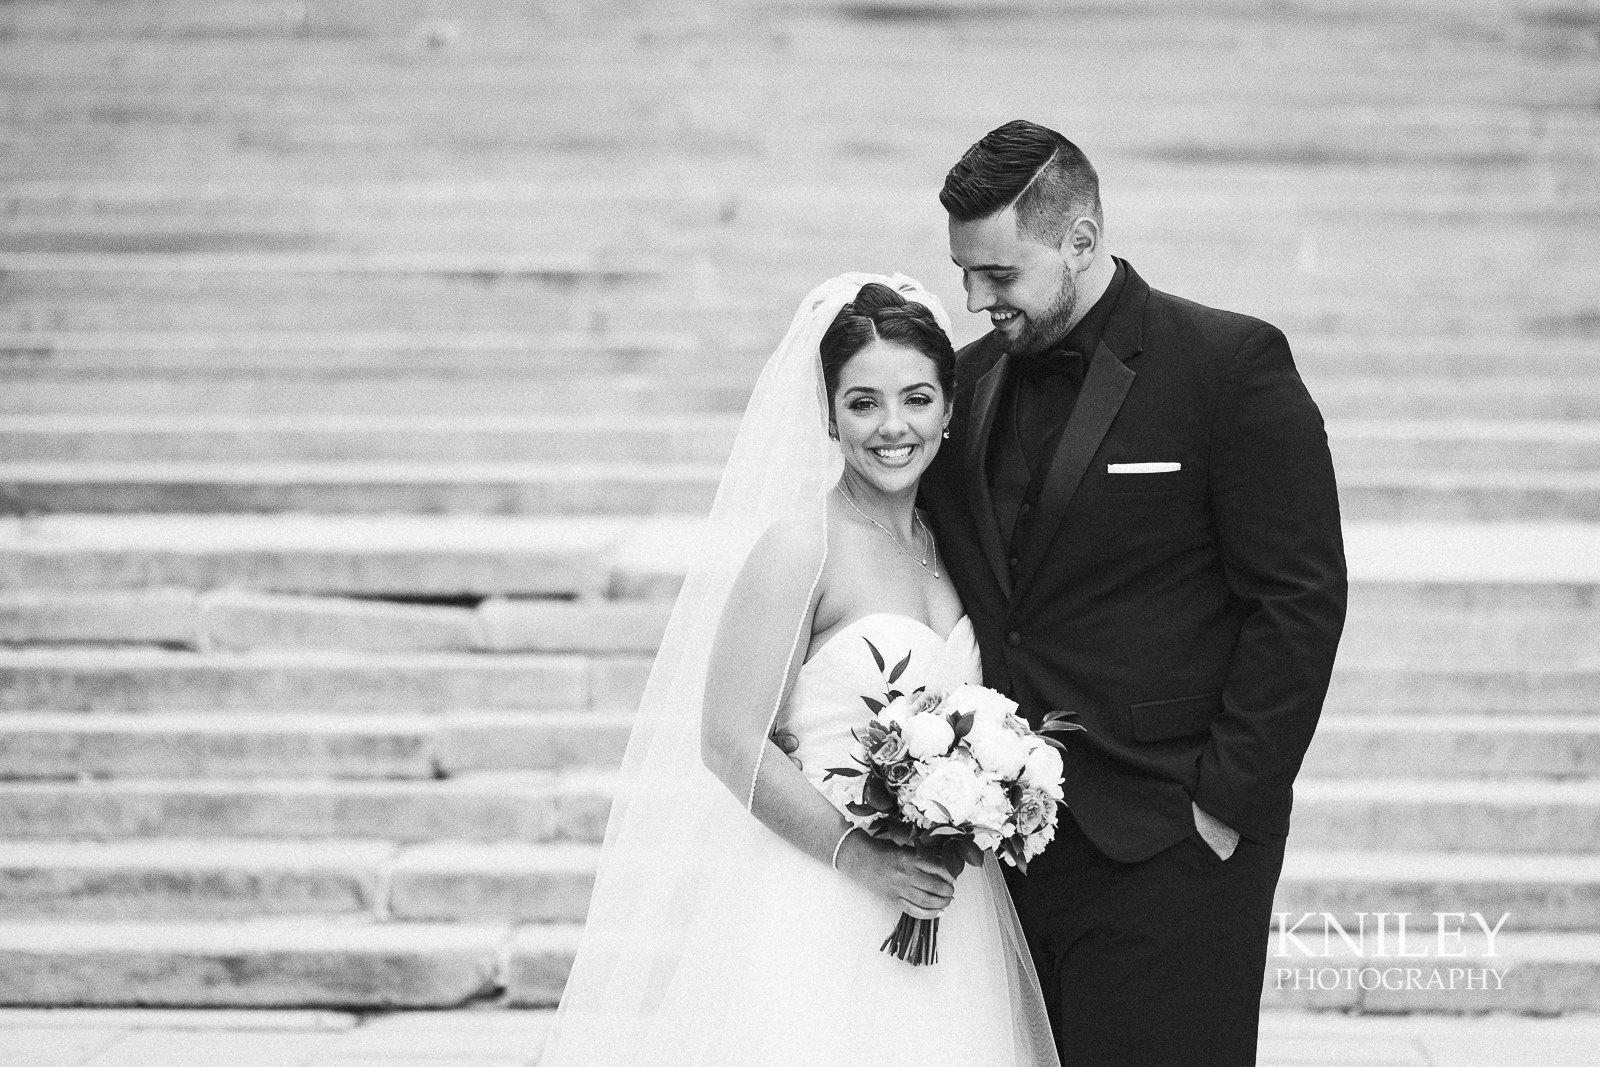 040 - Hoyt Lake Buffalo NY Wedding Pictures -XT2A7645.jpg